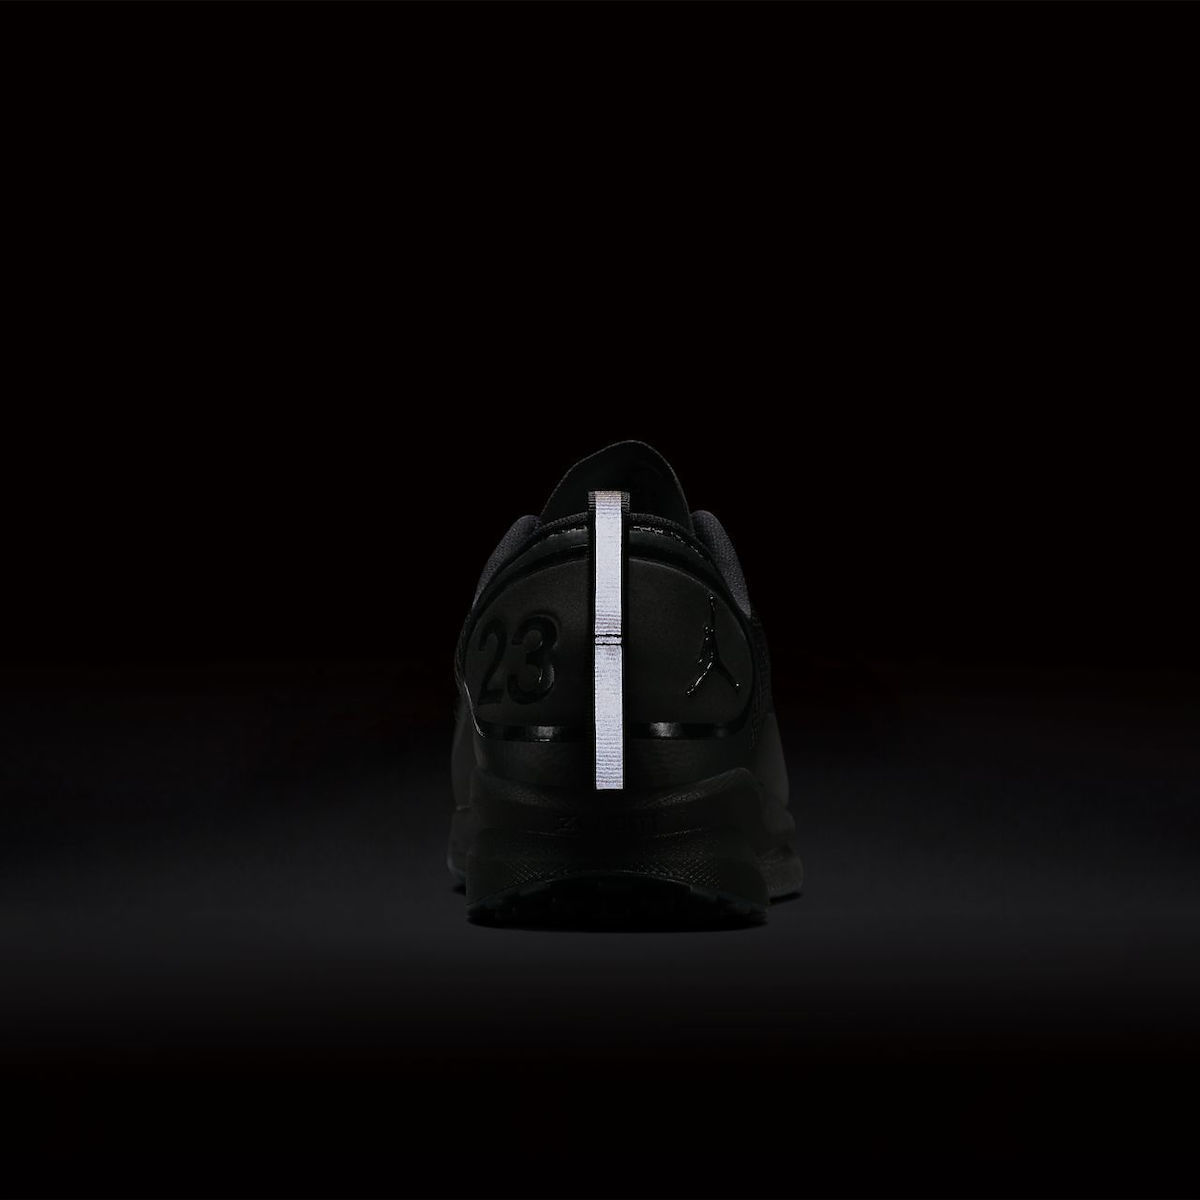 c1902937 Nike Jordan Zoom Tenacity AH8111-011 - Skroutz.gr